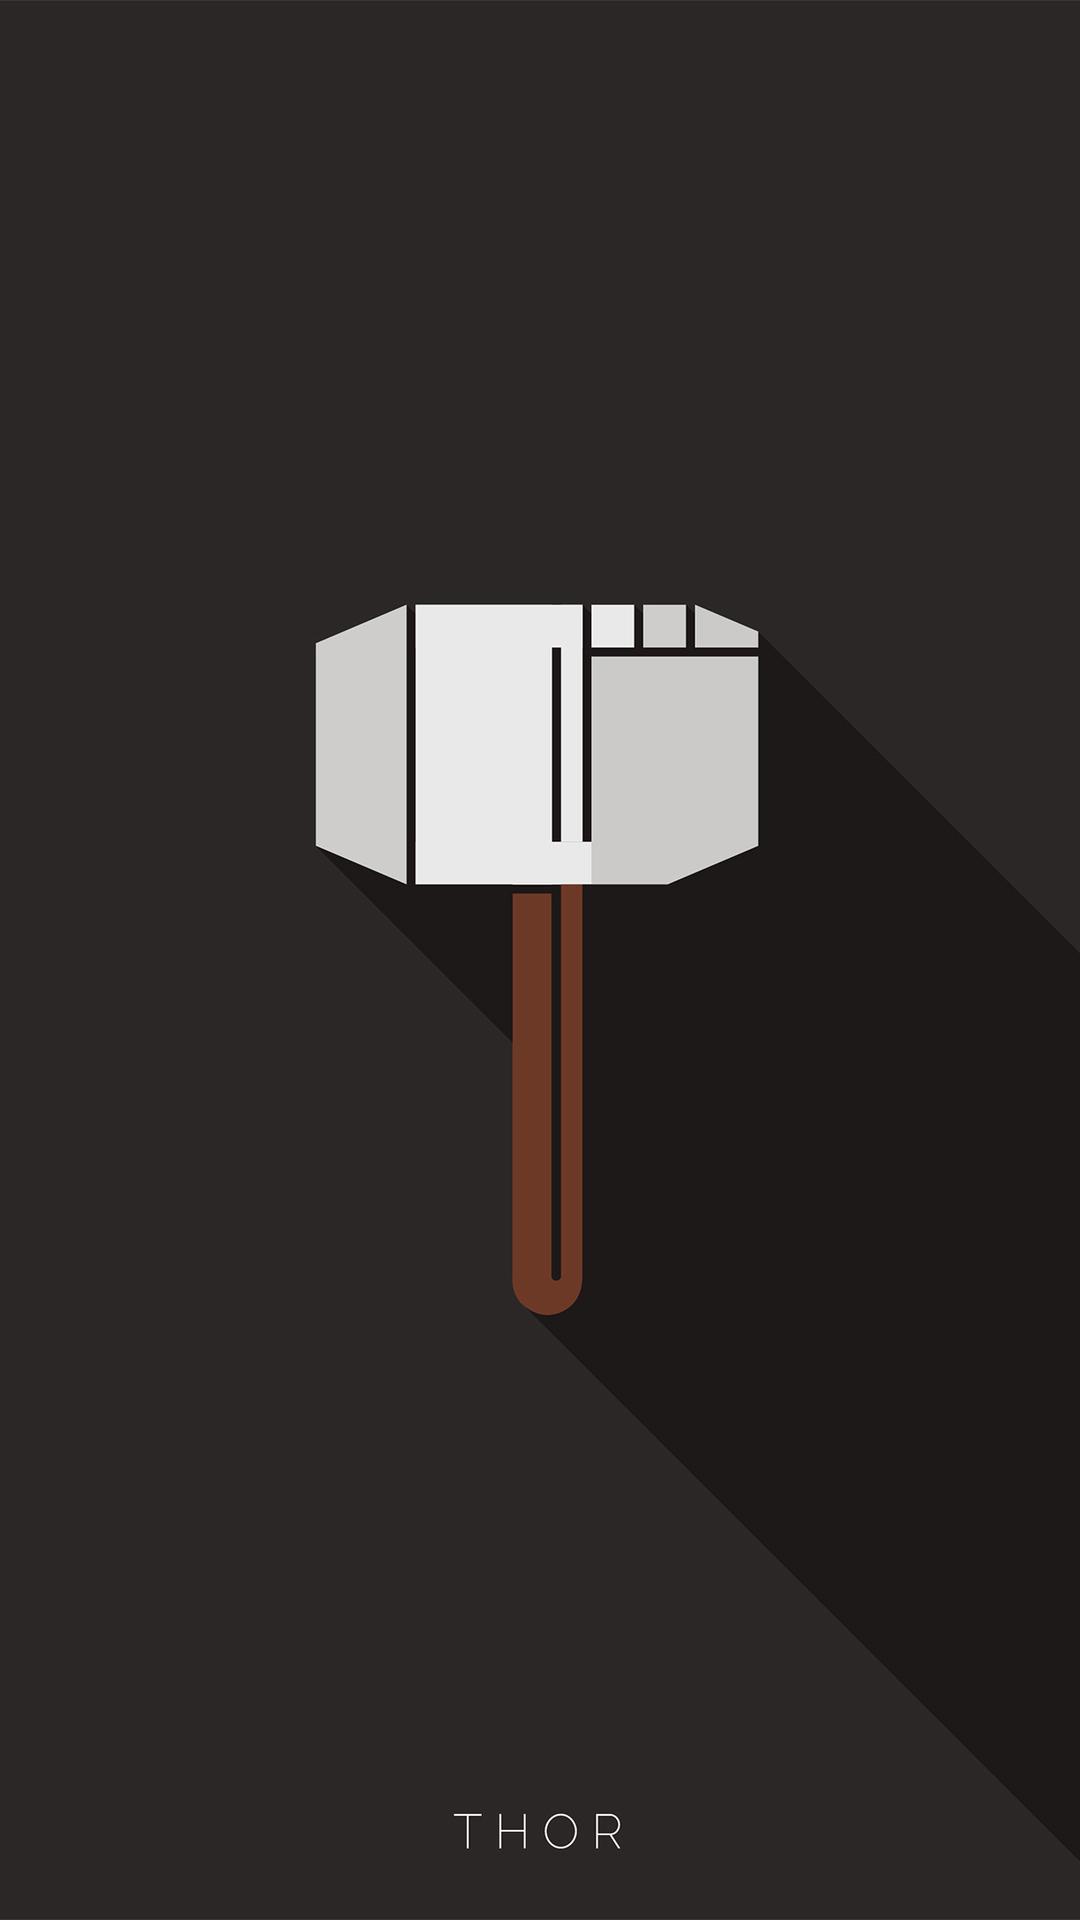 Thor Minimal iPhone Wallpaper